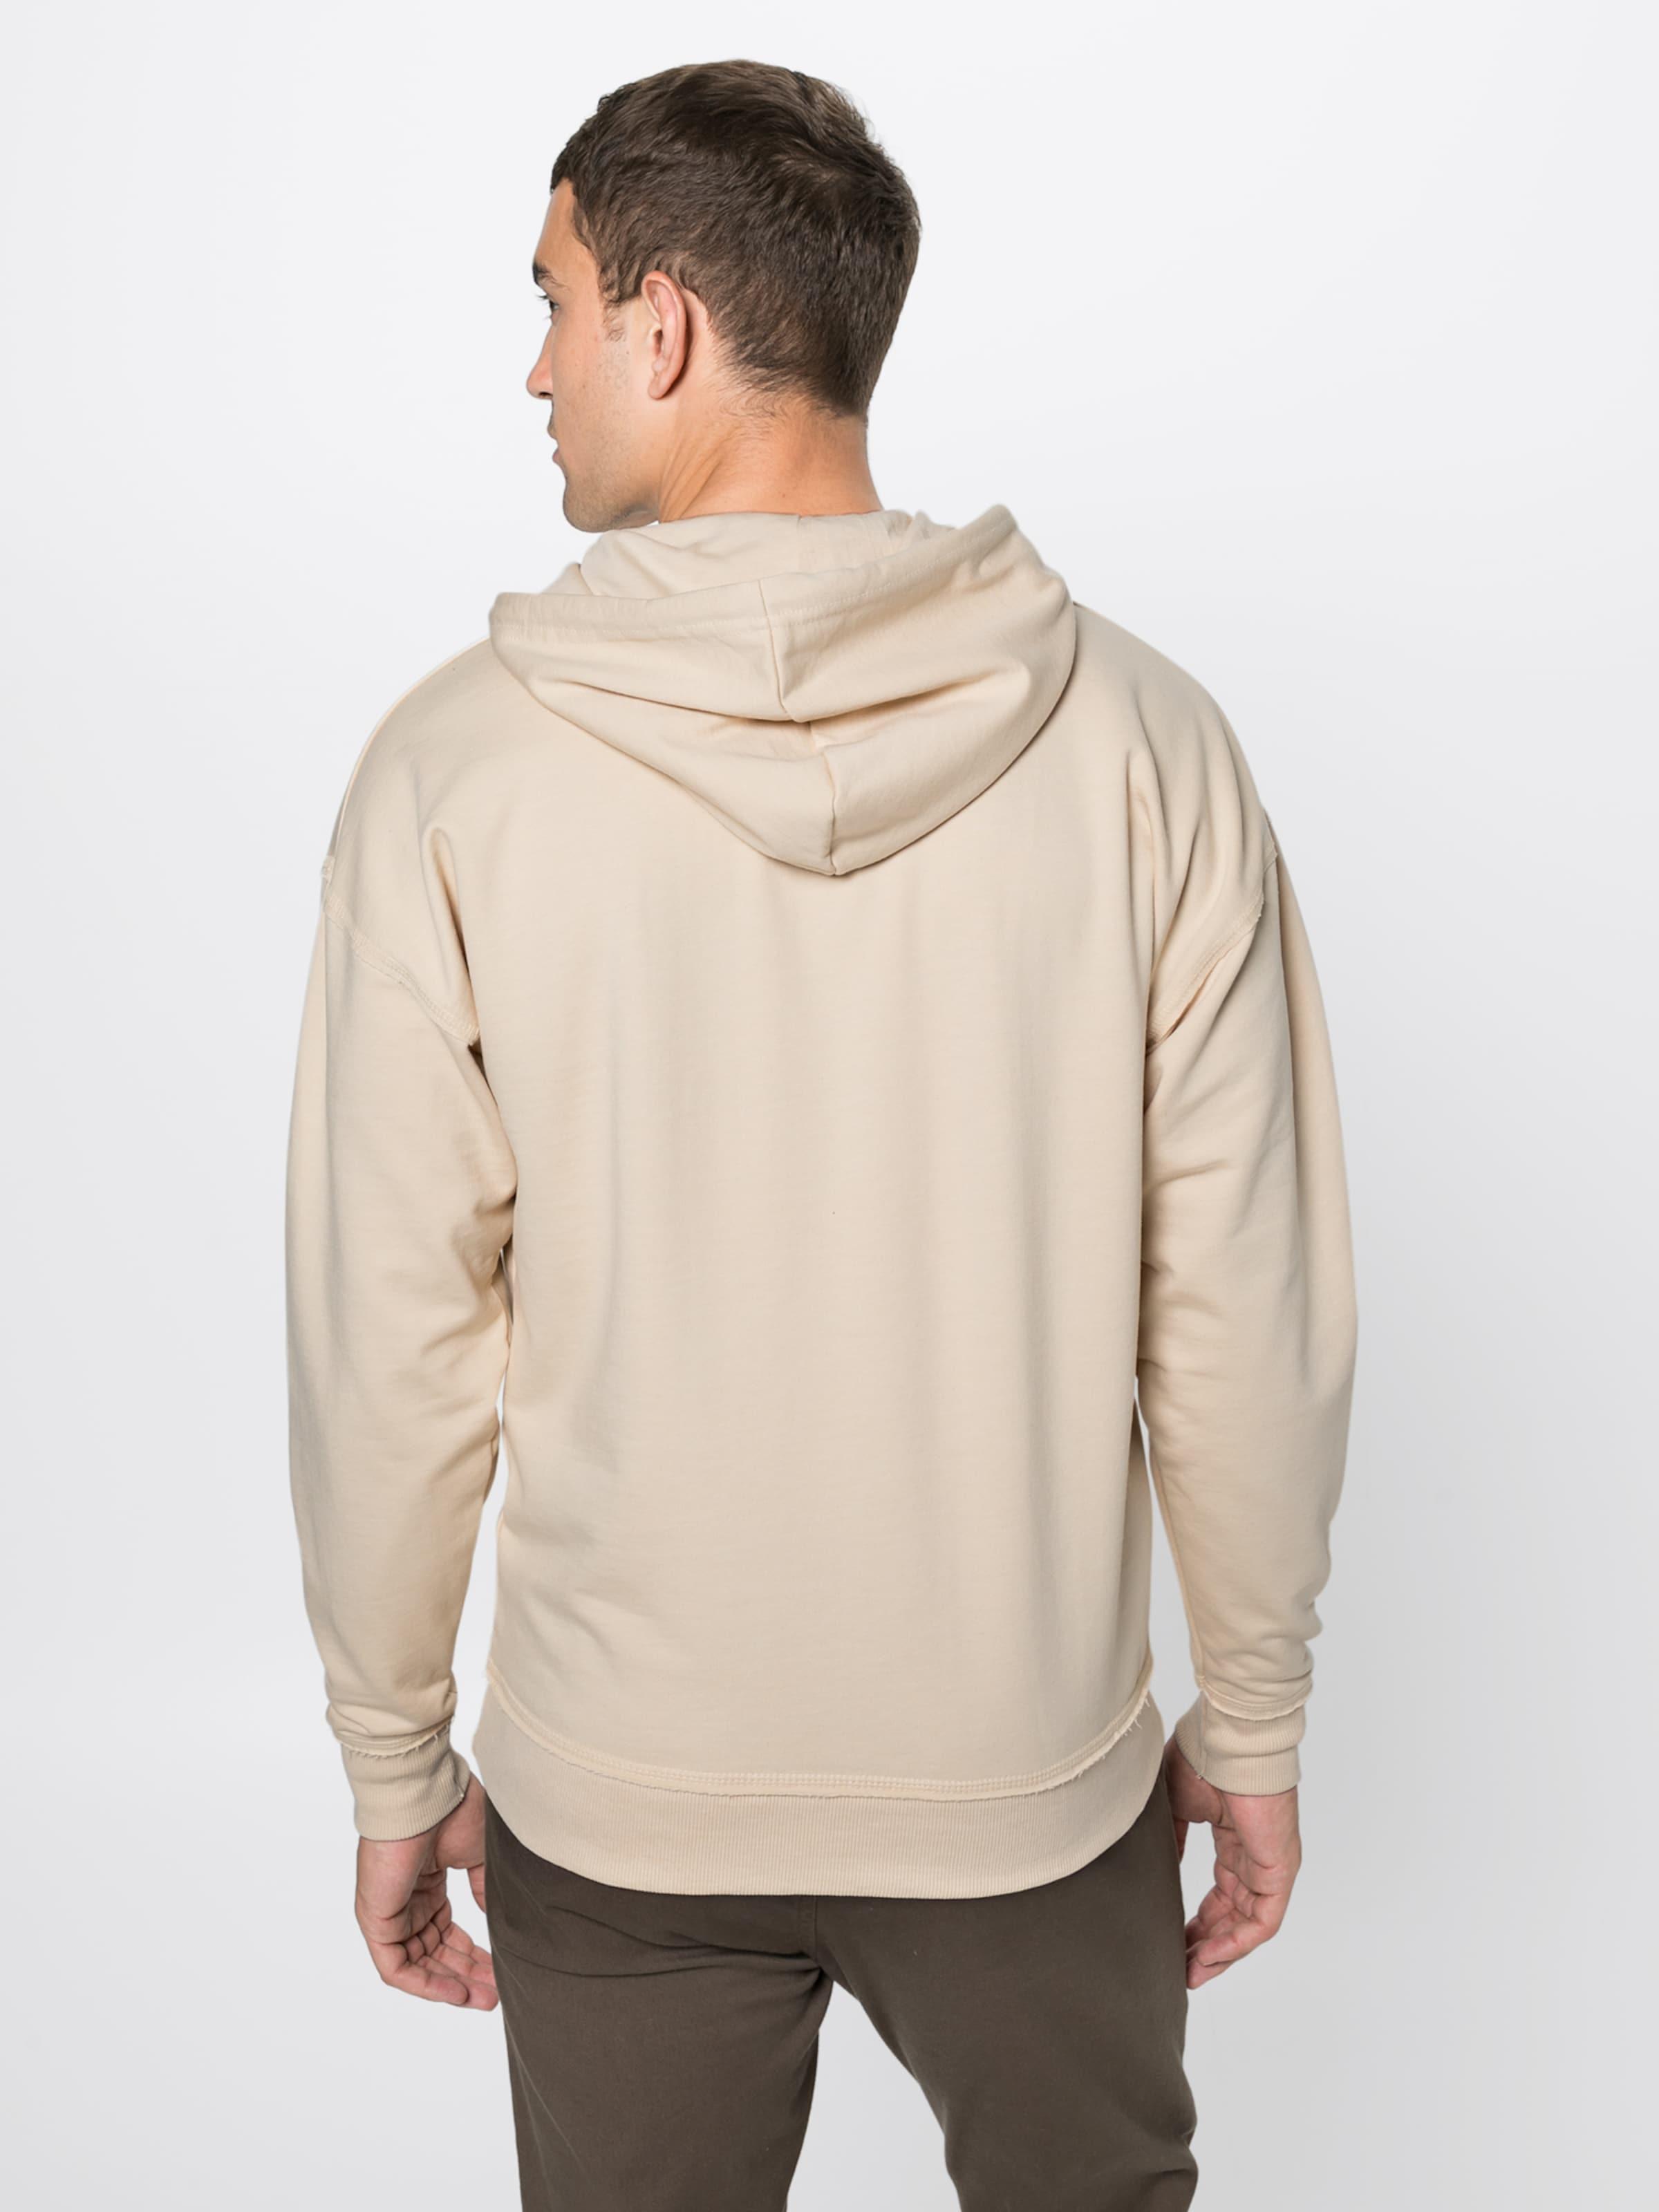 Jaune Sweat Classics En Urban shirt ybYf76g